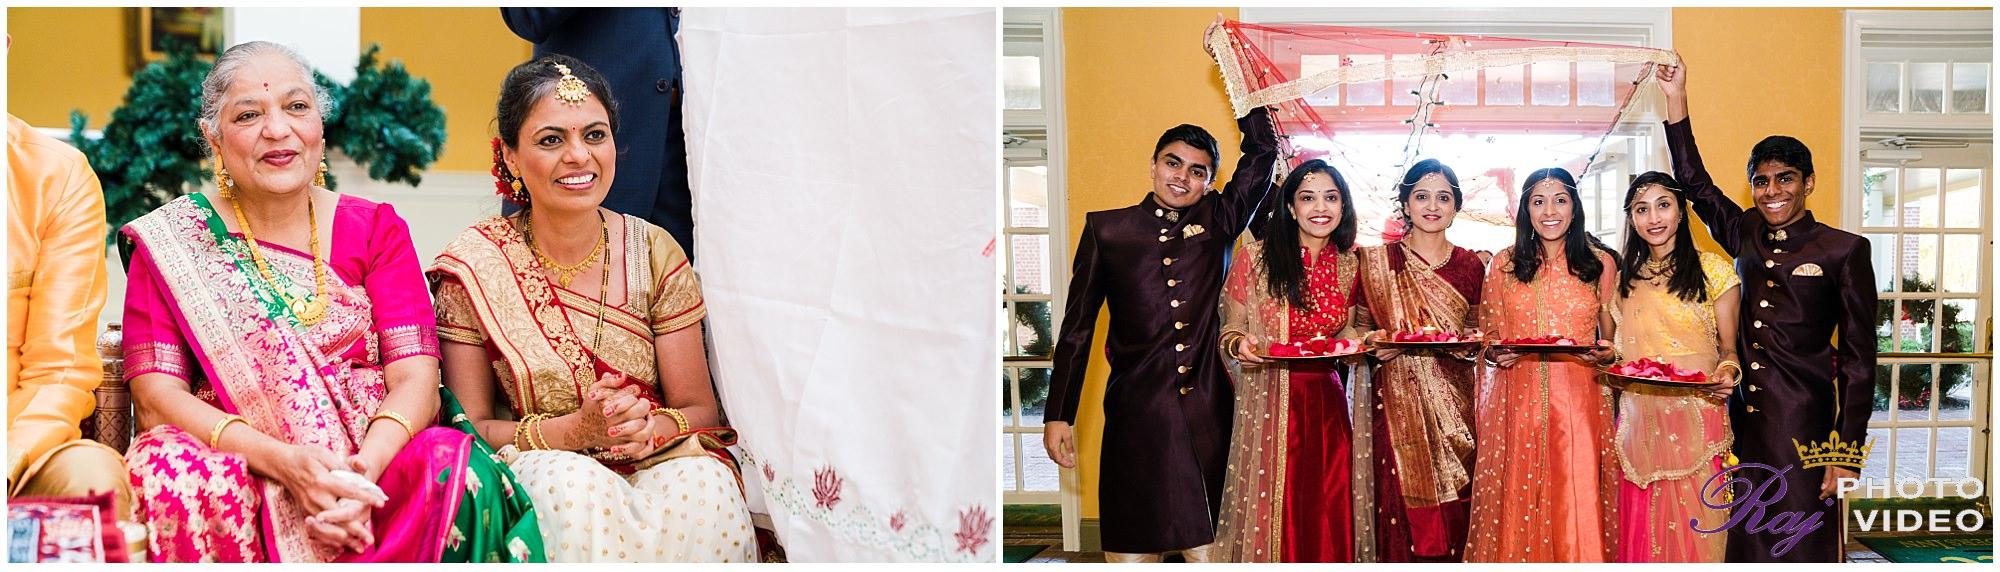 Founders-Inn-and-Spa-Virginia-Beach-VA-Indian-Wedding-Harini-Vivek-33.jpg